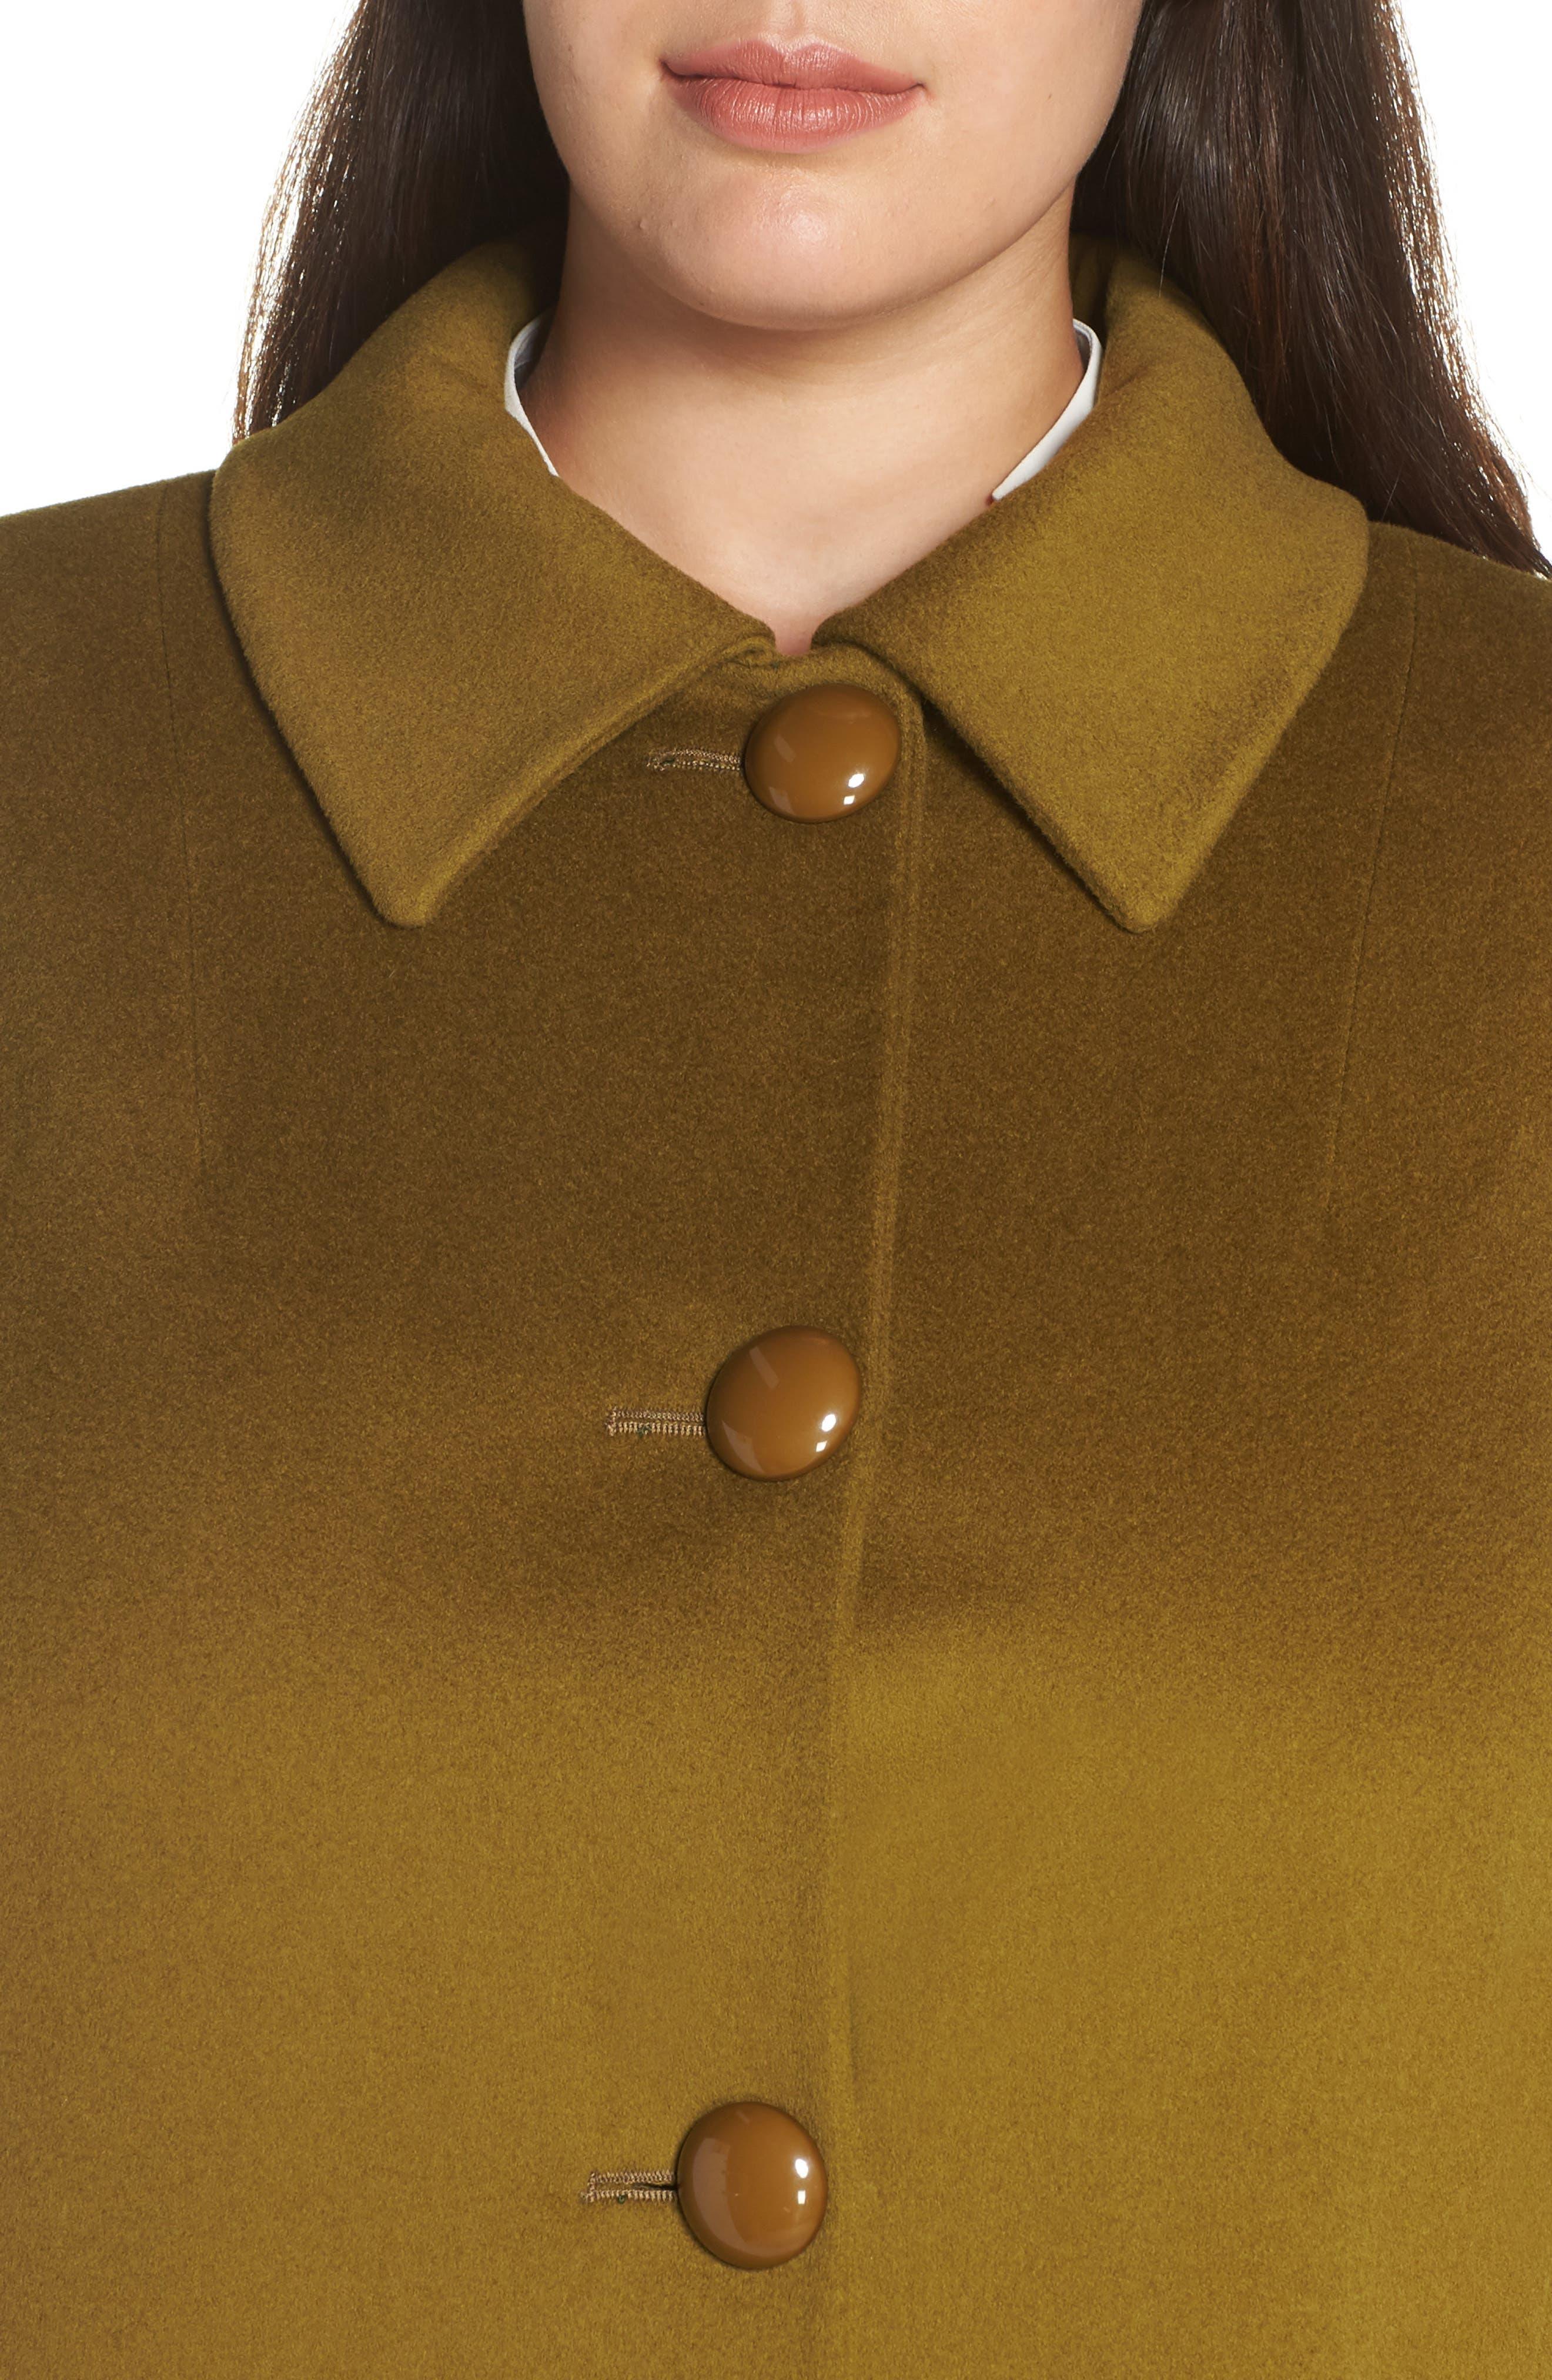 FLEURETTE,                             Loro Piana Wool Car Coat,                             Alternate thumbnail 4, color,                             305